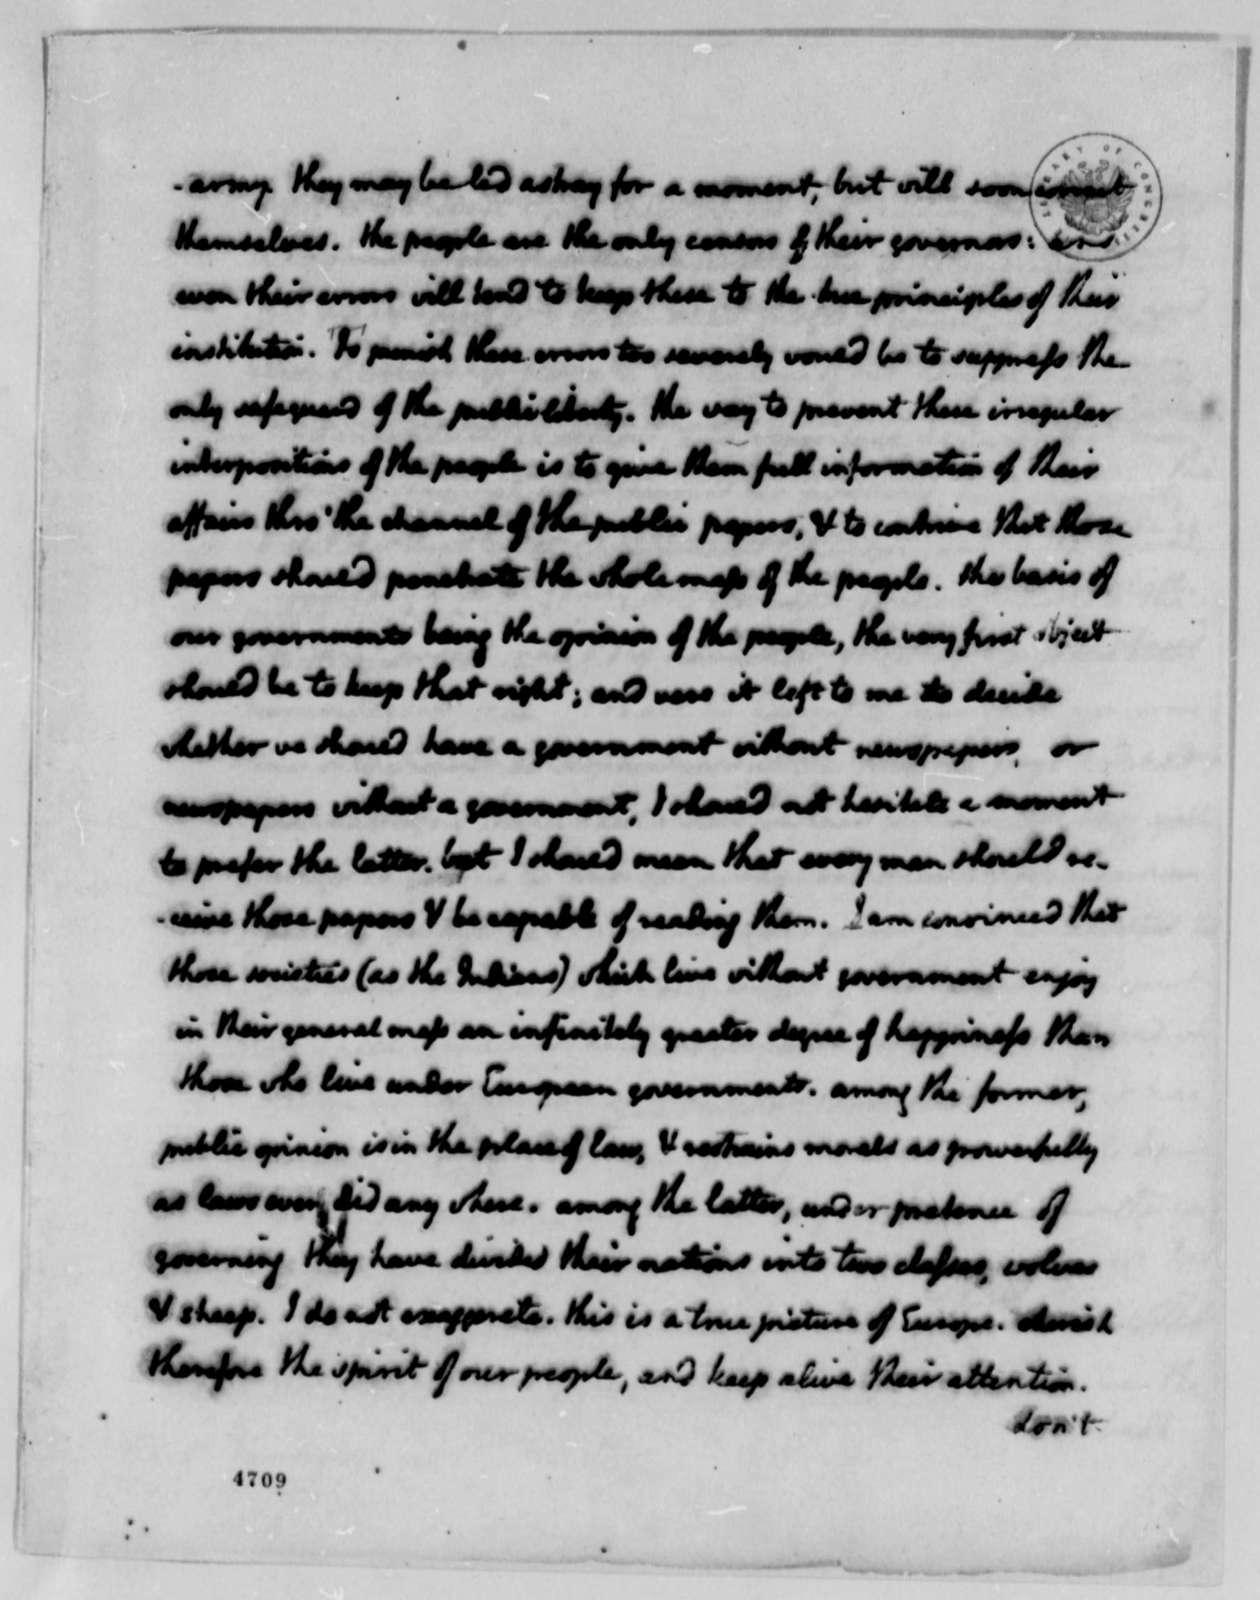 Thomas Jefferson to Edward Carrington, January 16, 1787